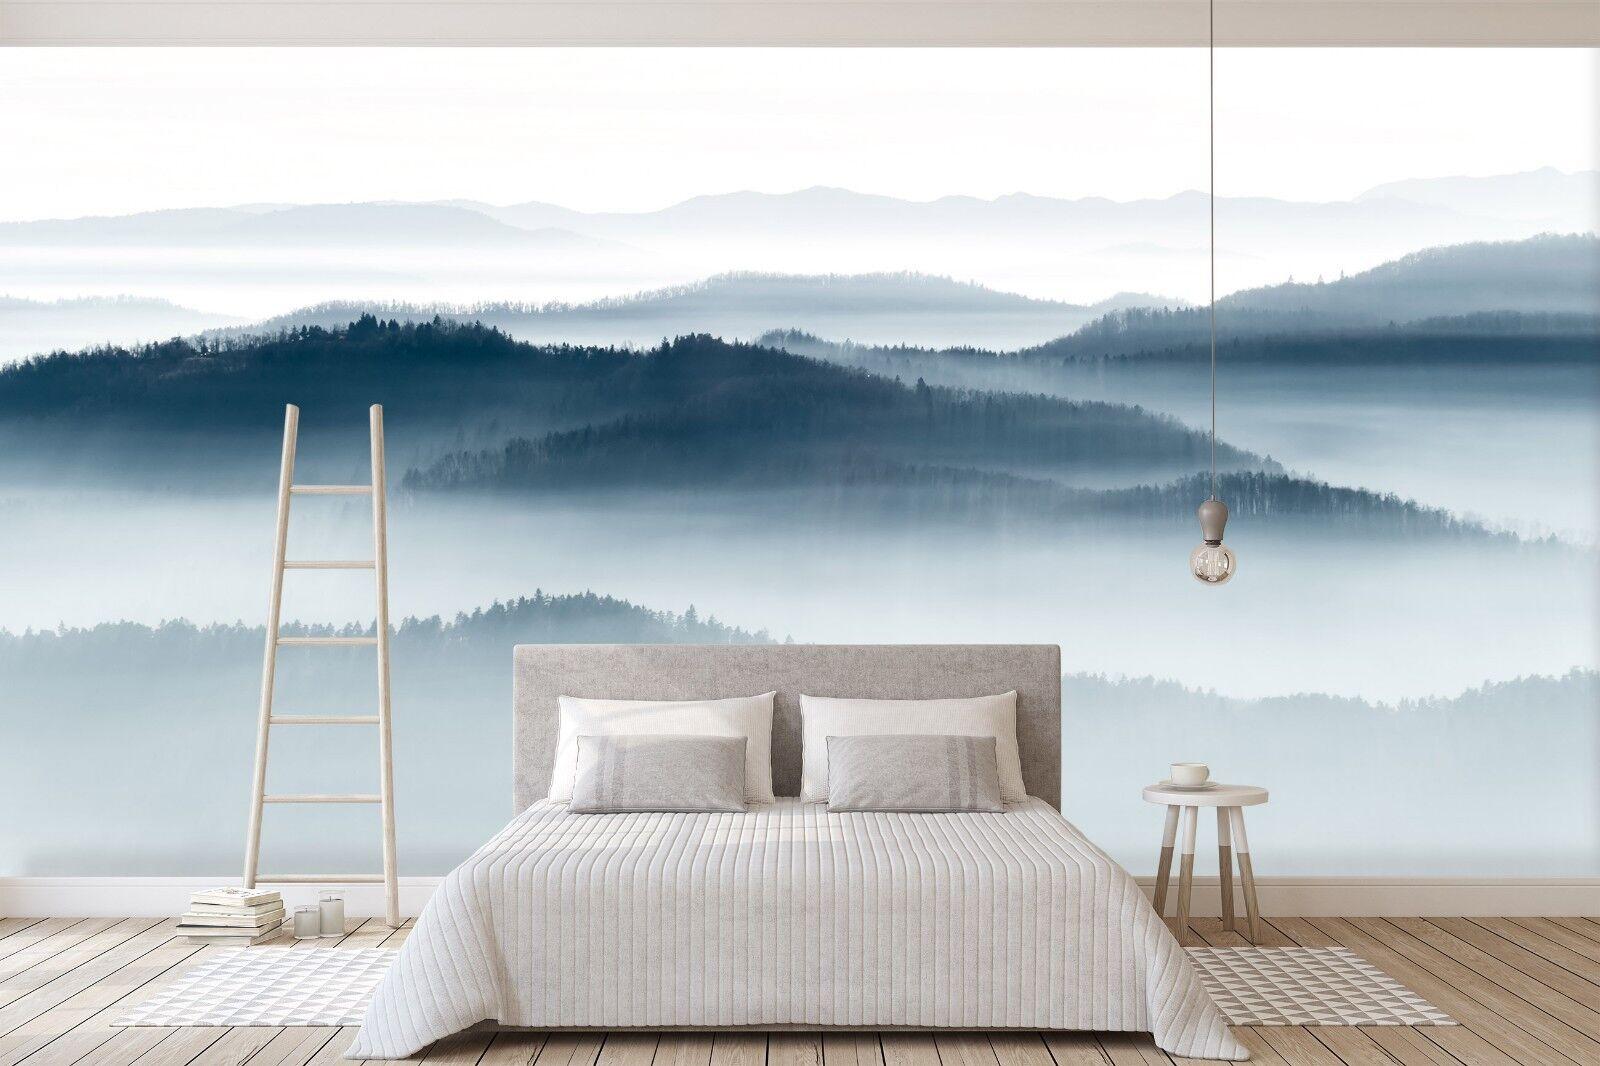 3D Misty Mountain Scenery 52 Wallpaper Murals Wall Print Wallpaper Mural AJ WALL